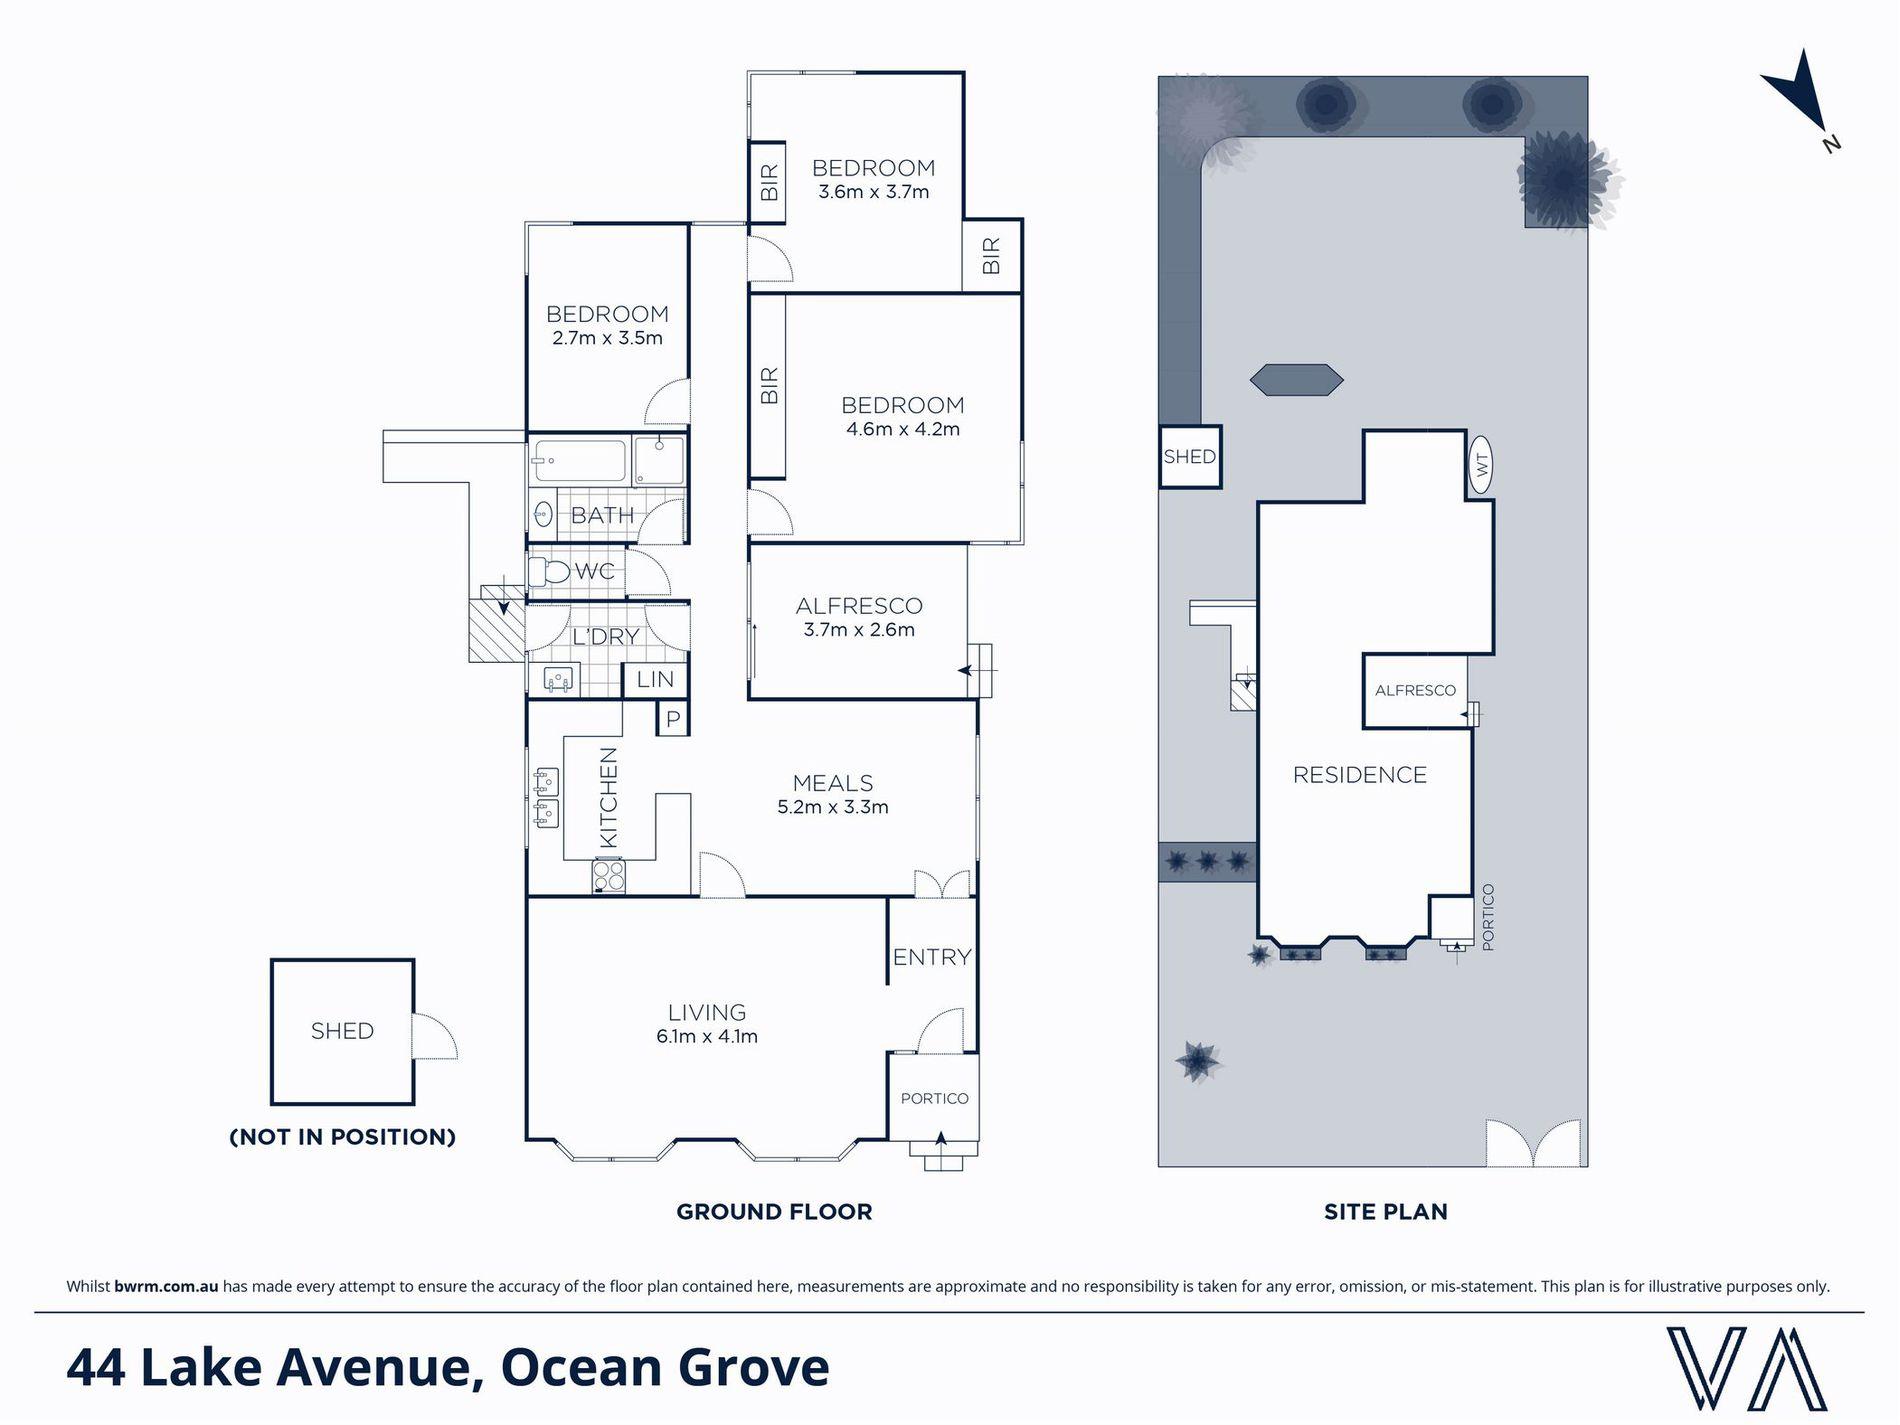 44 Lake Avenue, Ocean Grove